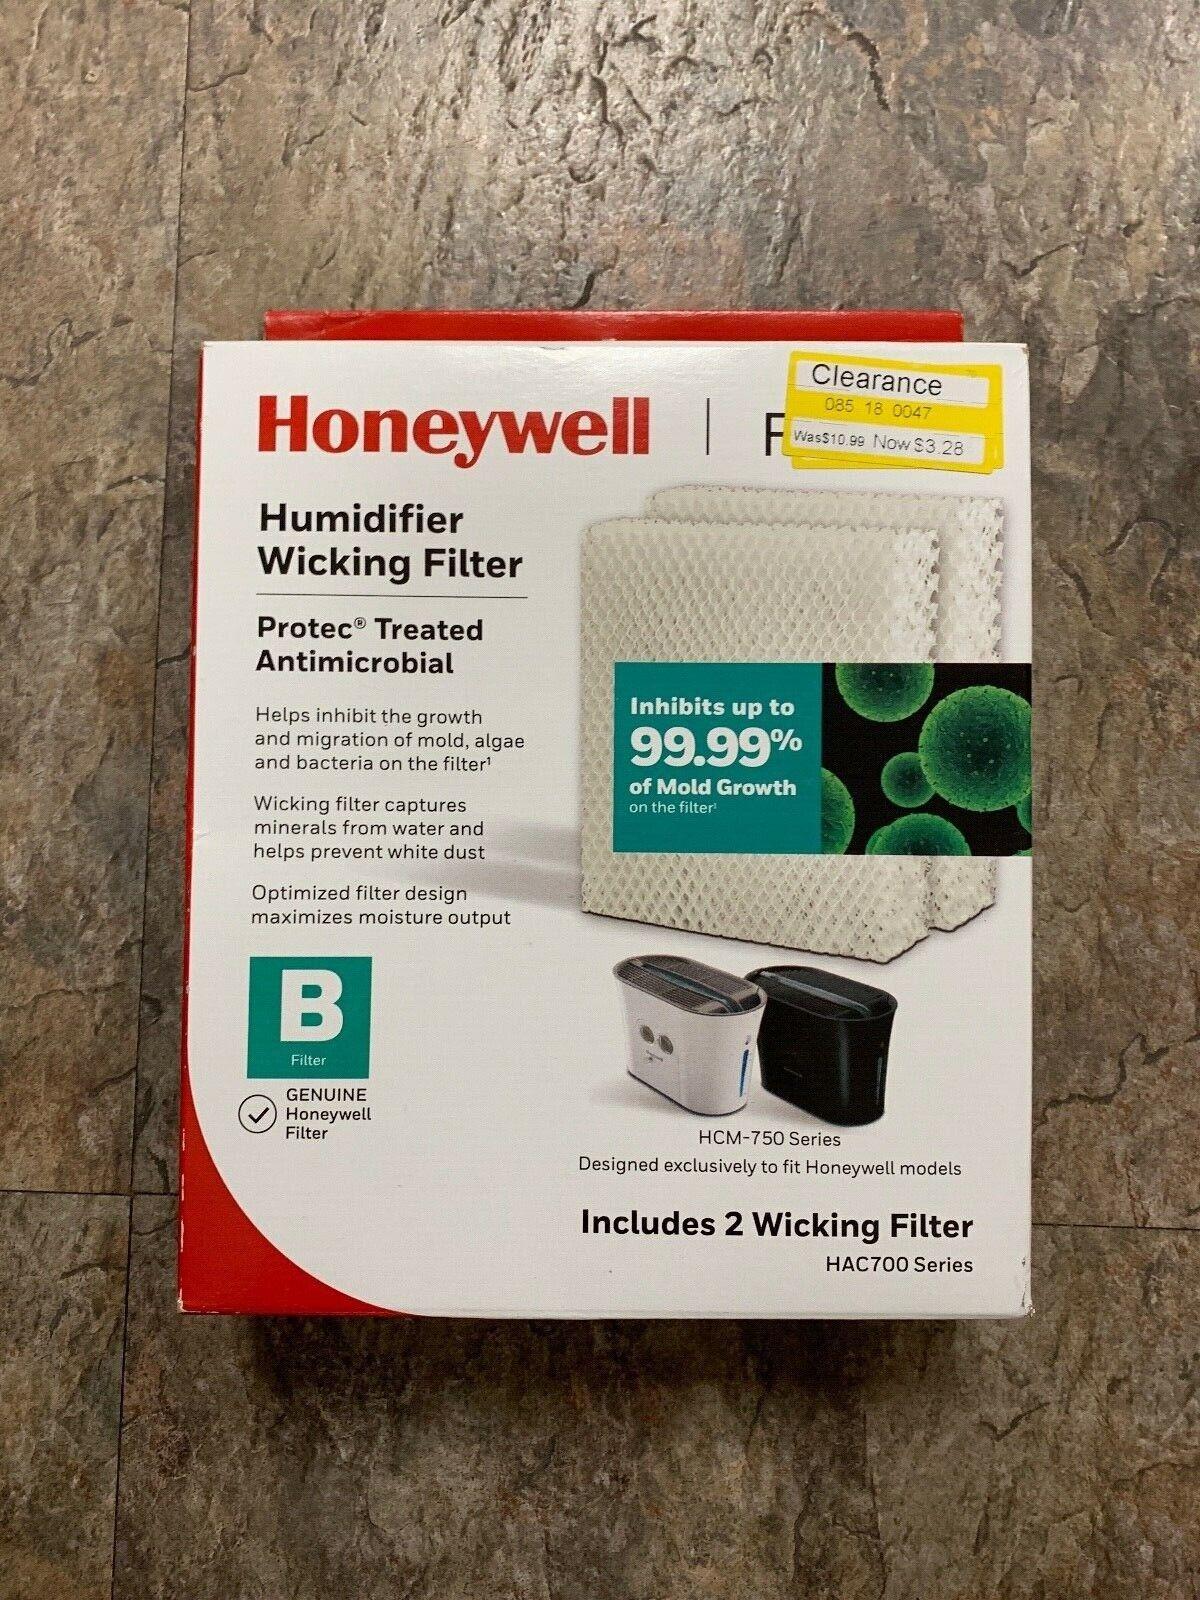 Honeywell Humidifier Filter B Model HAC-700NTG HCM-750 Serie